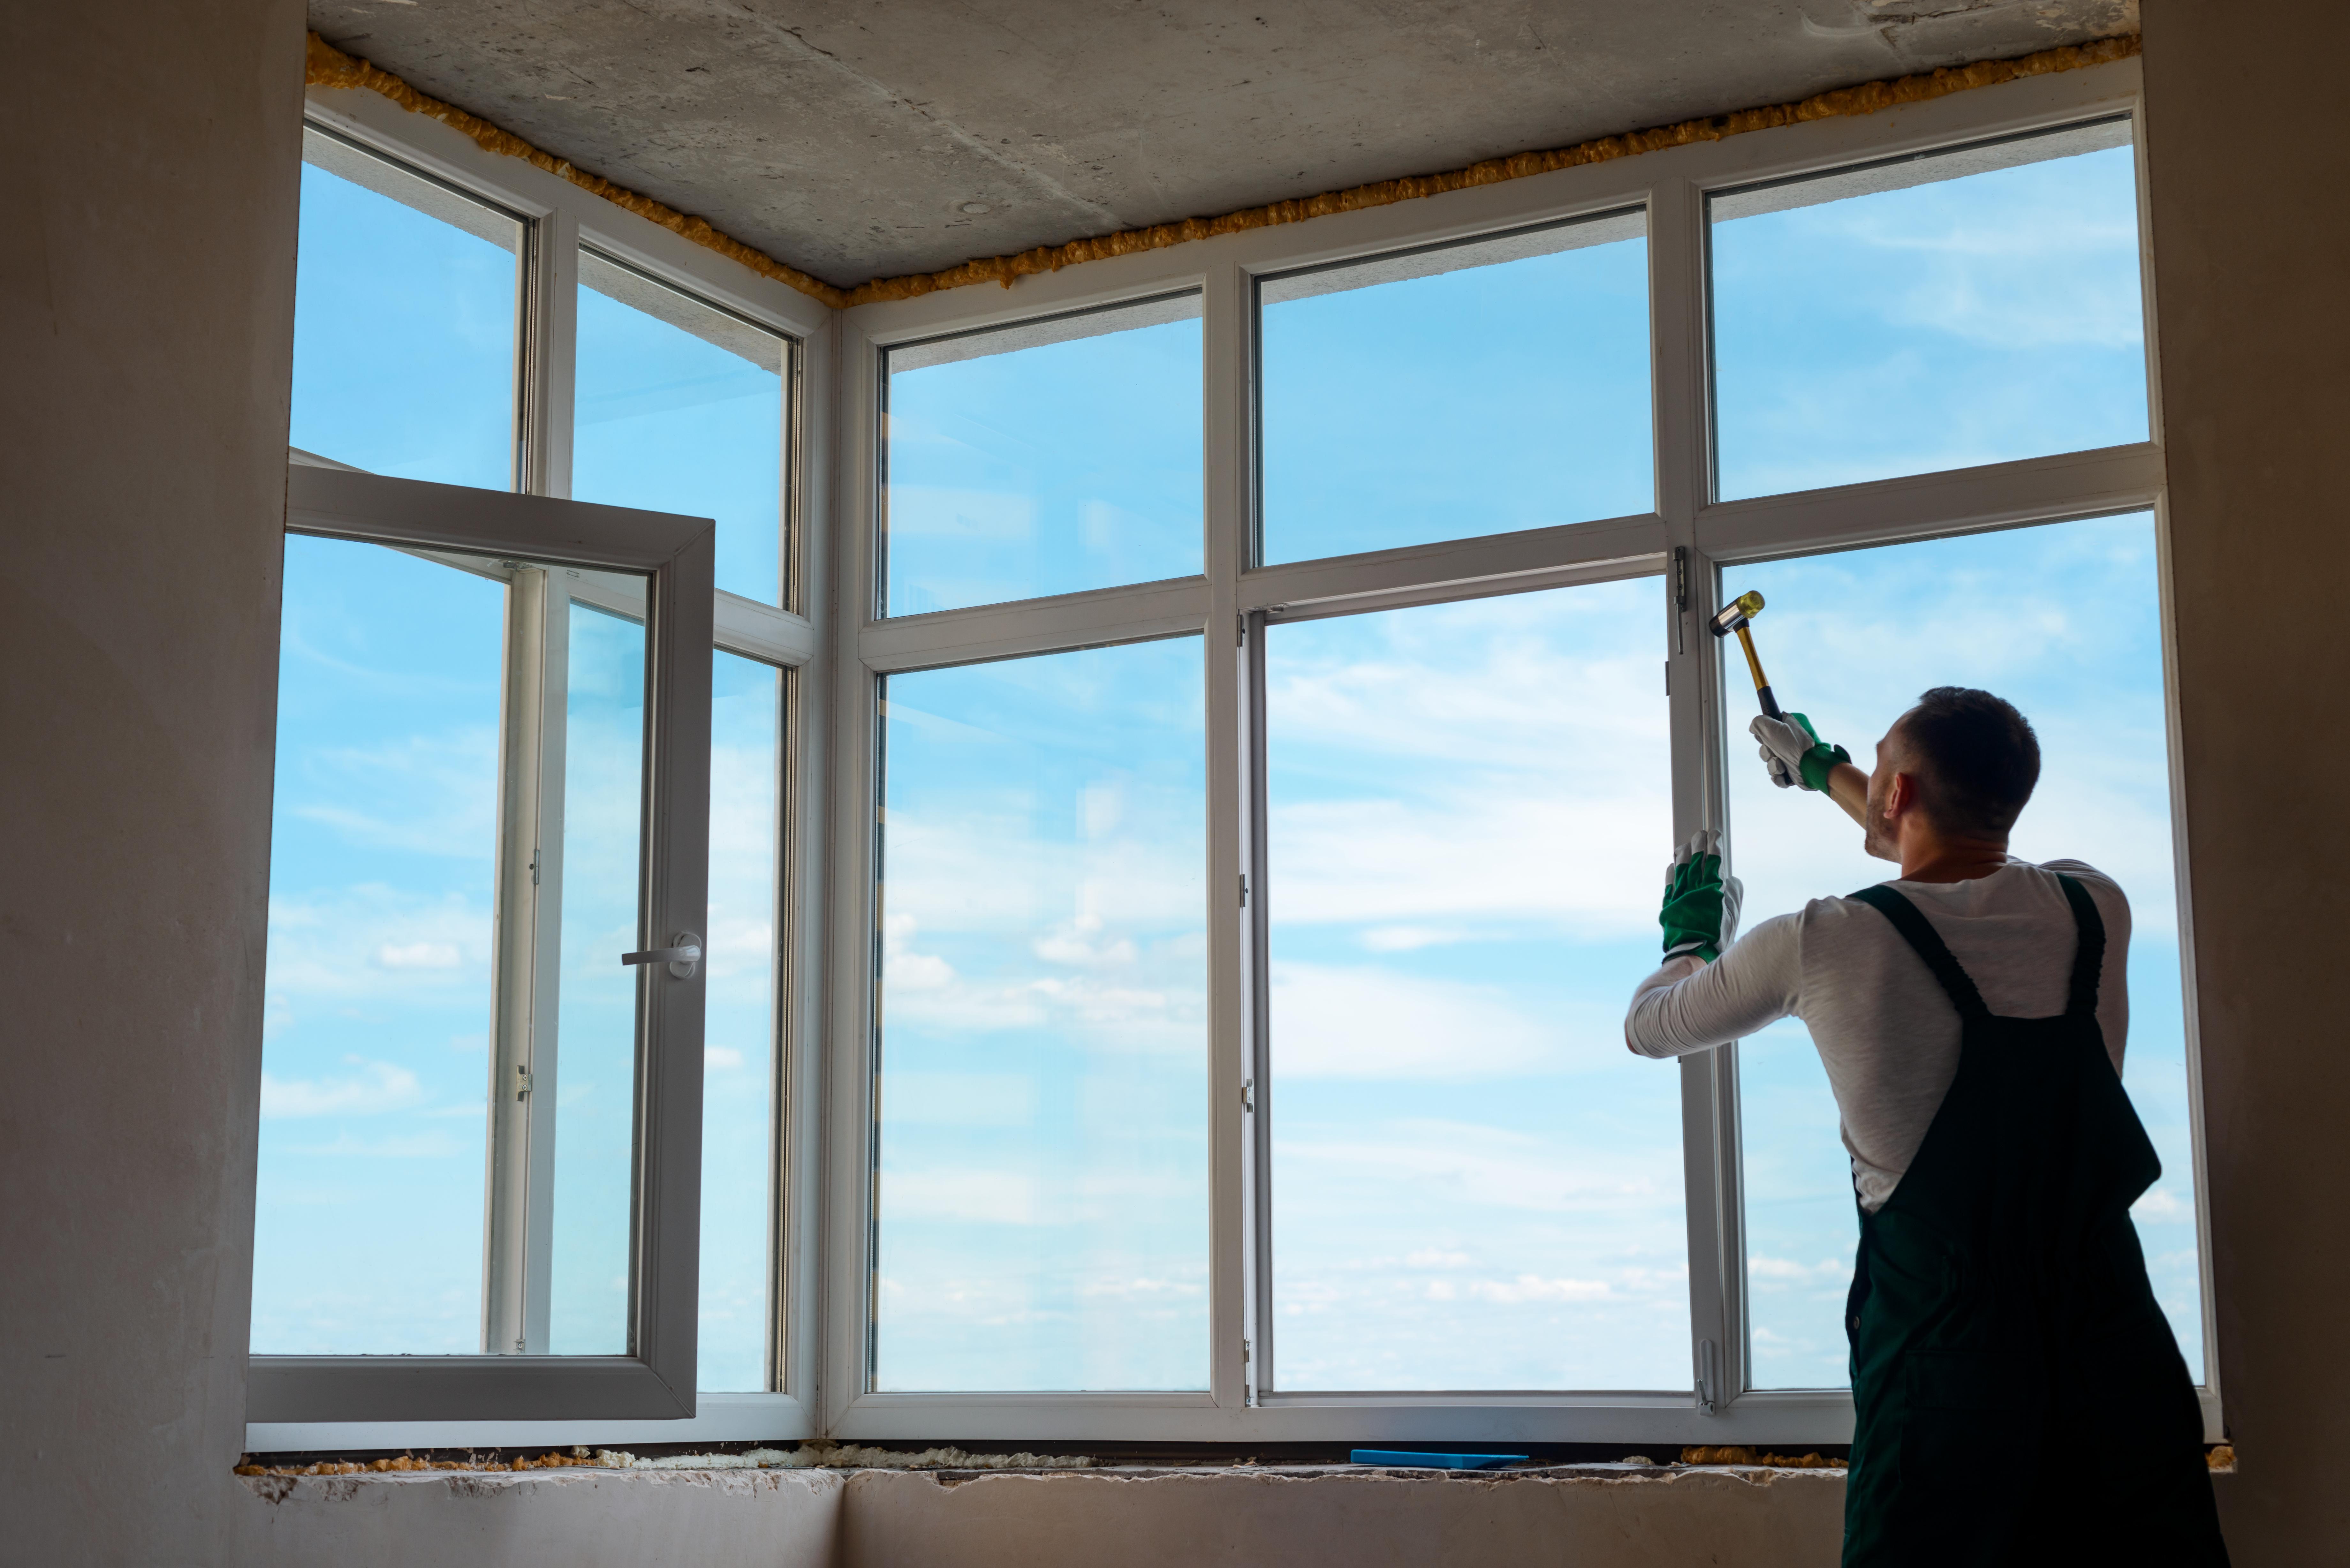 Builder is installing a window.